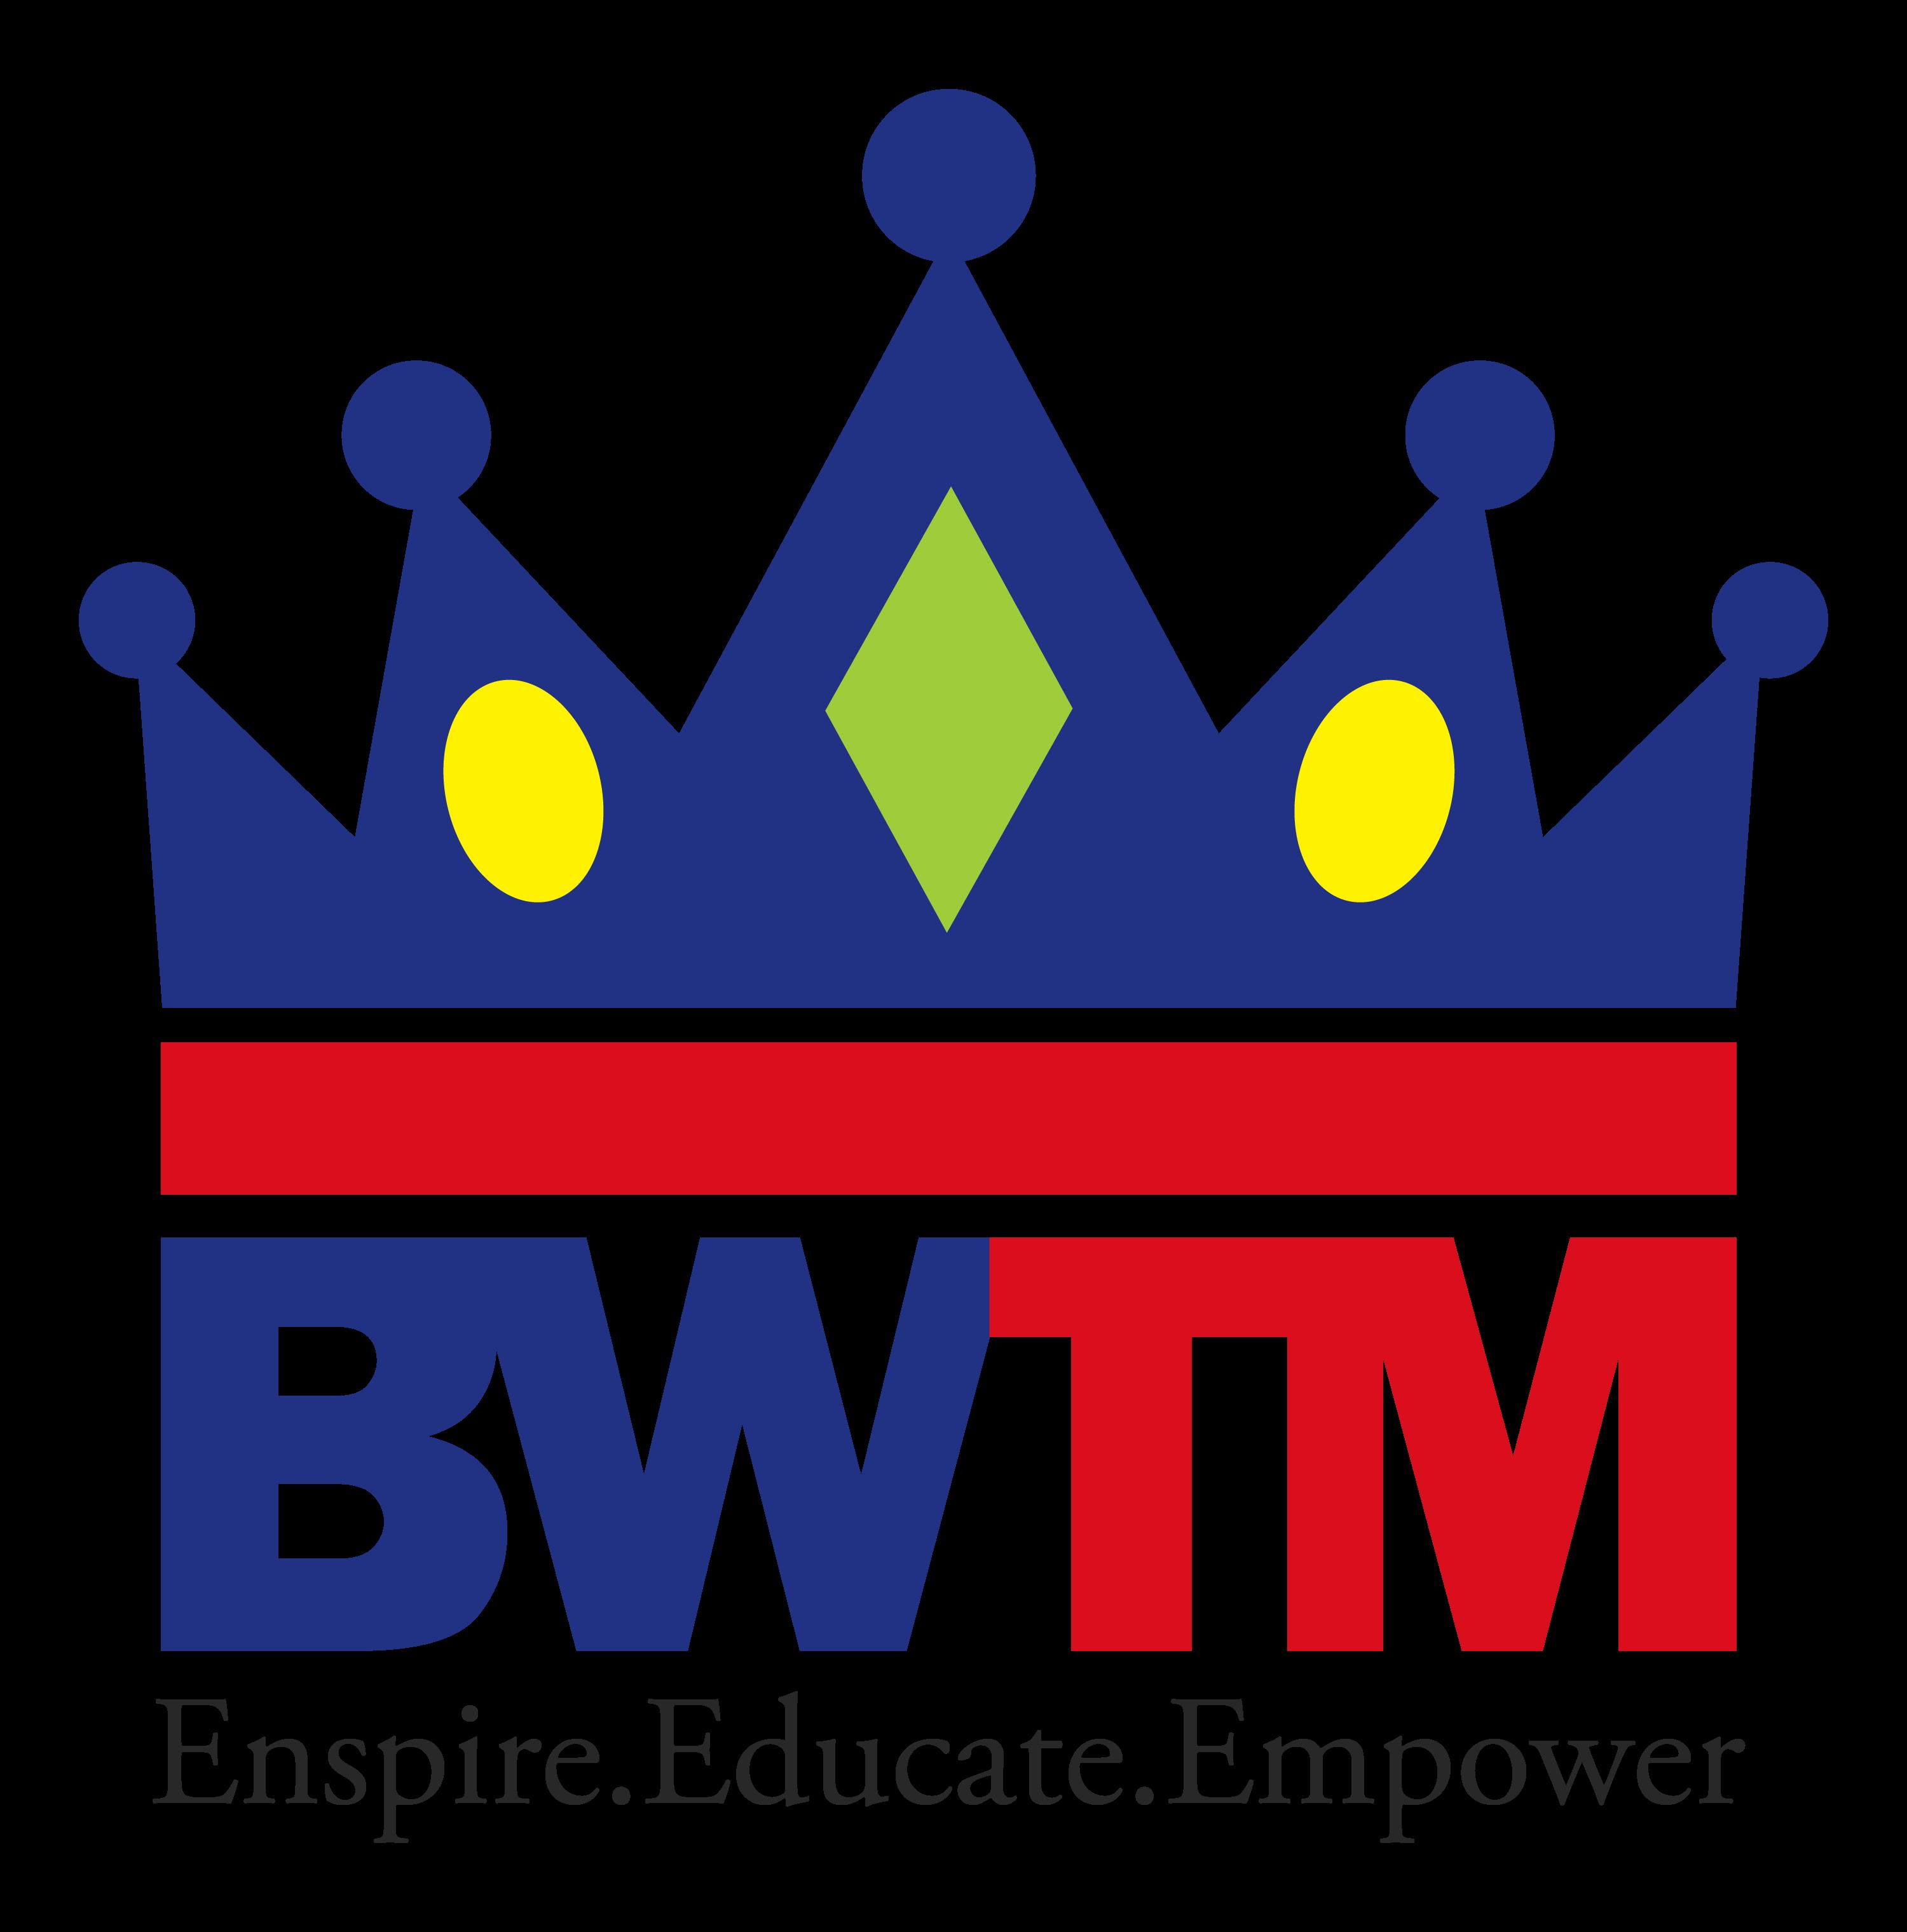 BWTM Sports Blog